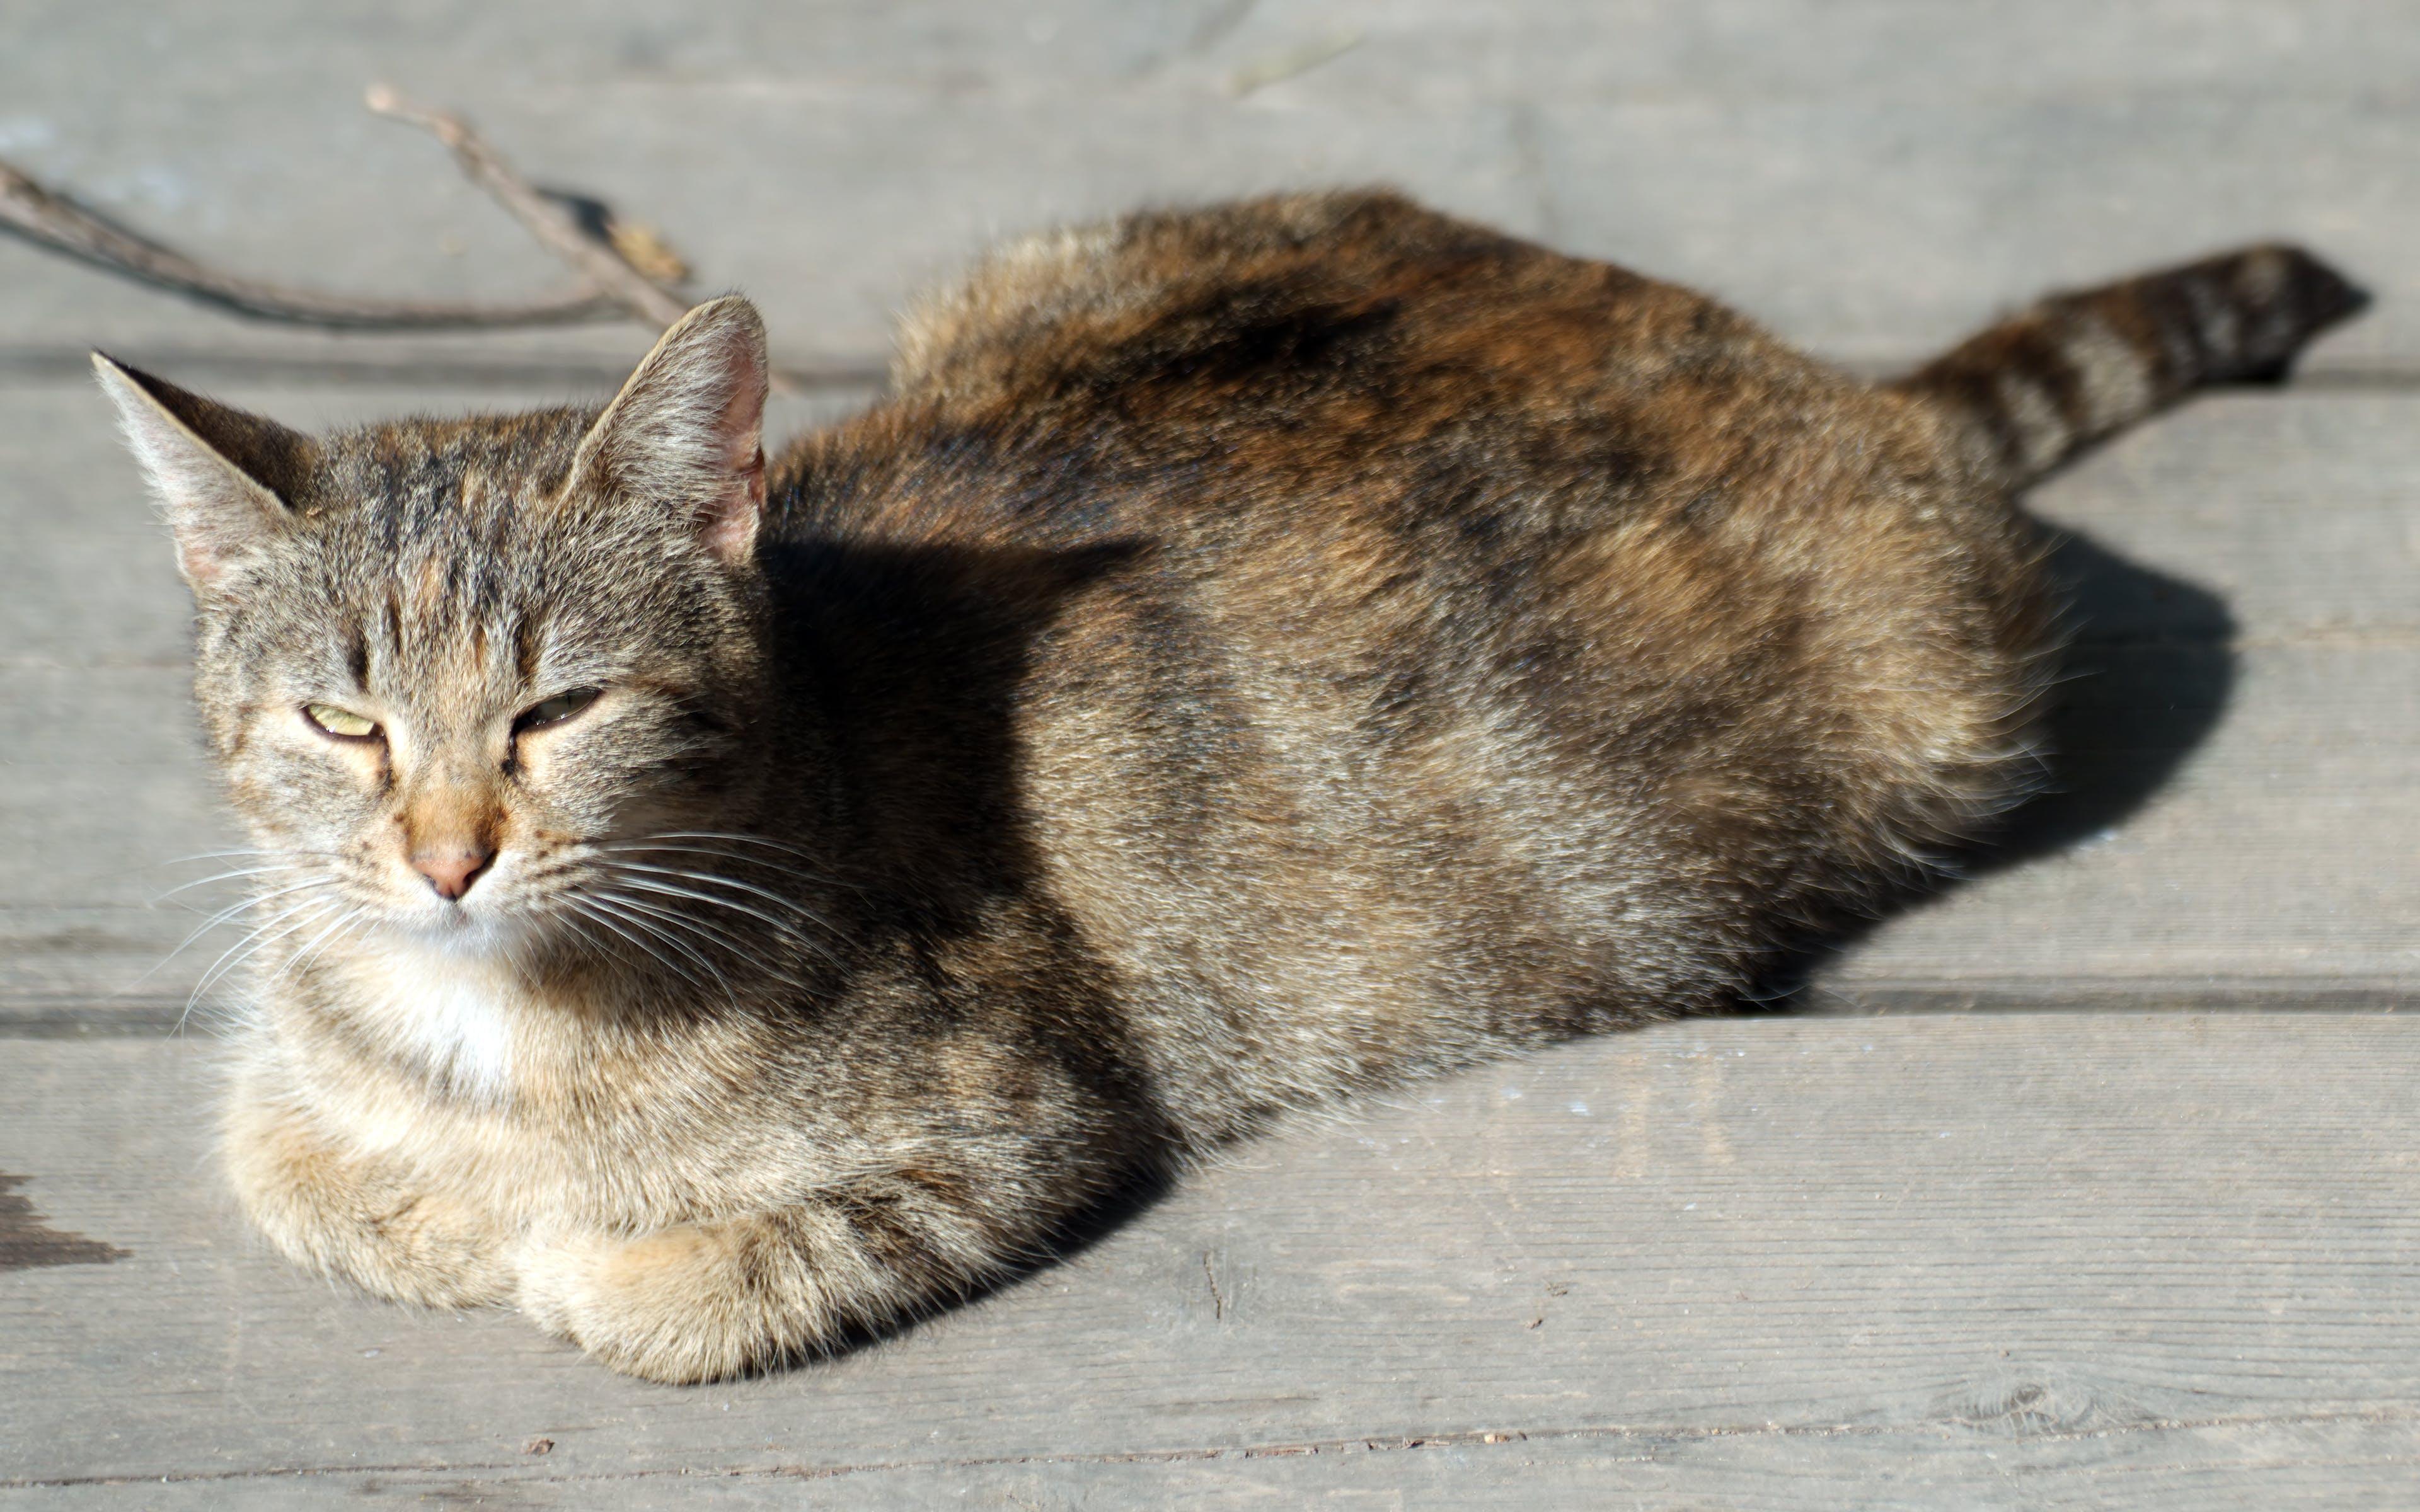 Free stock photo of animal, feline, grey cat sitting down, pet